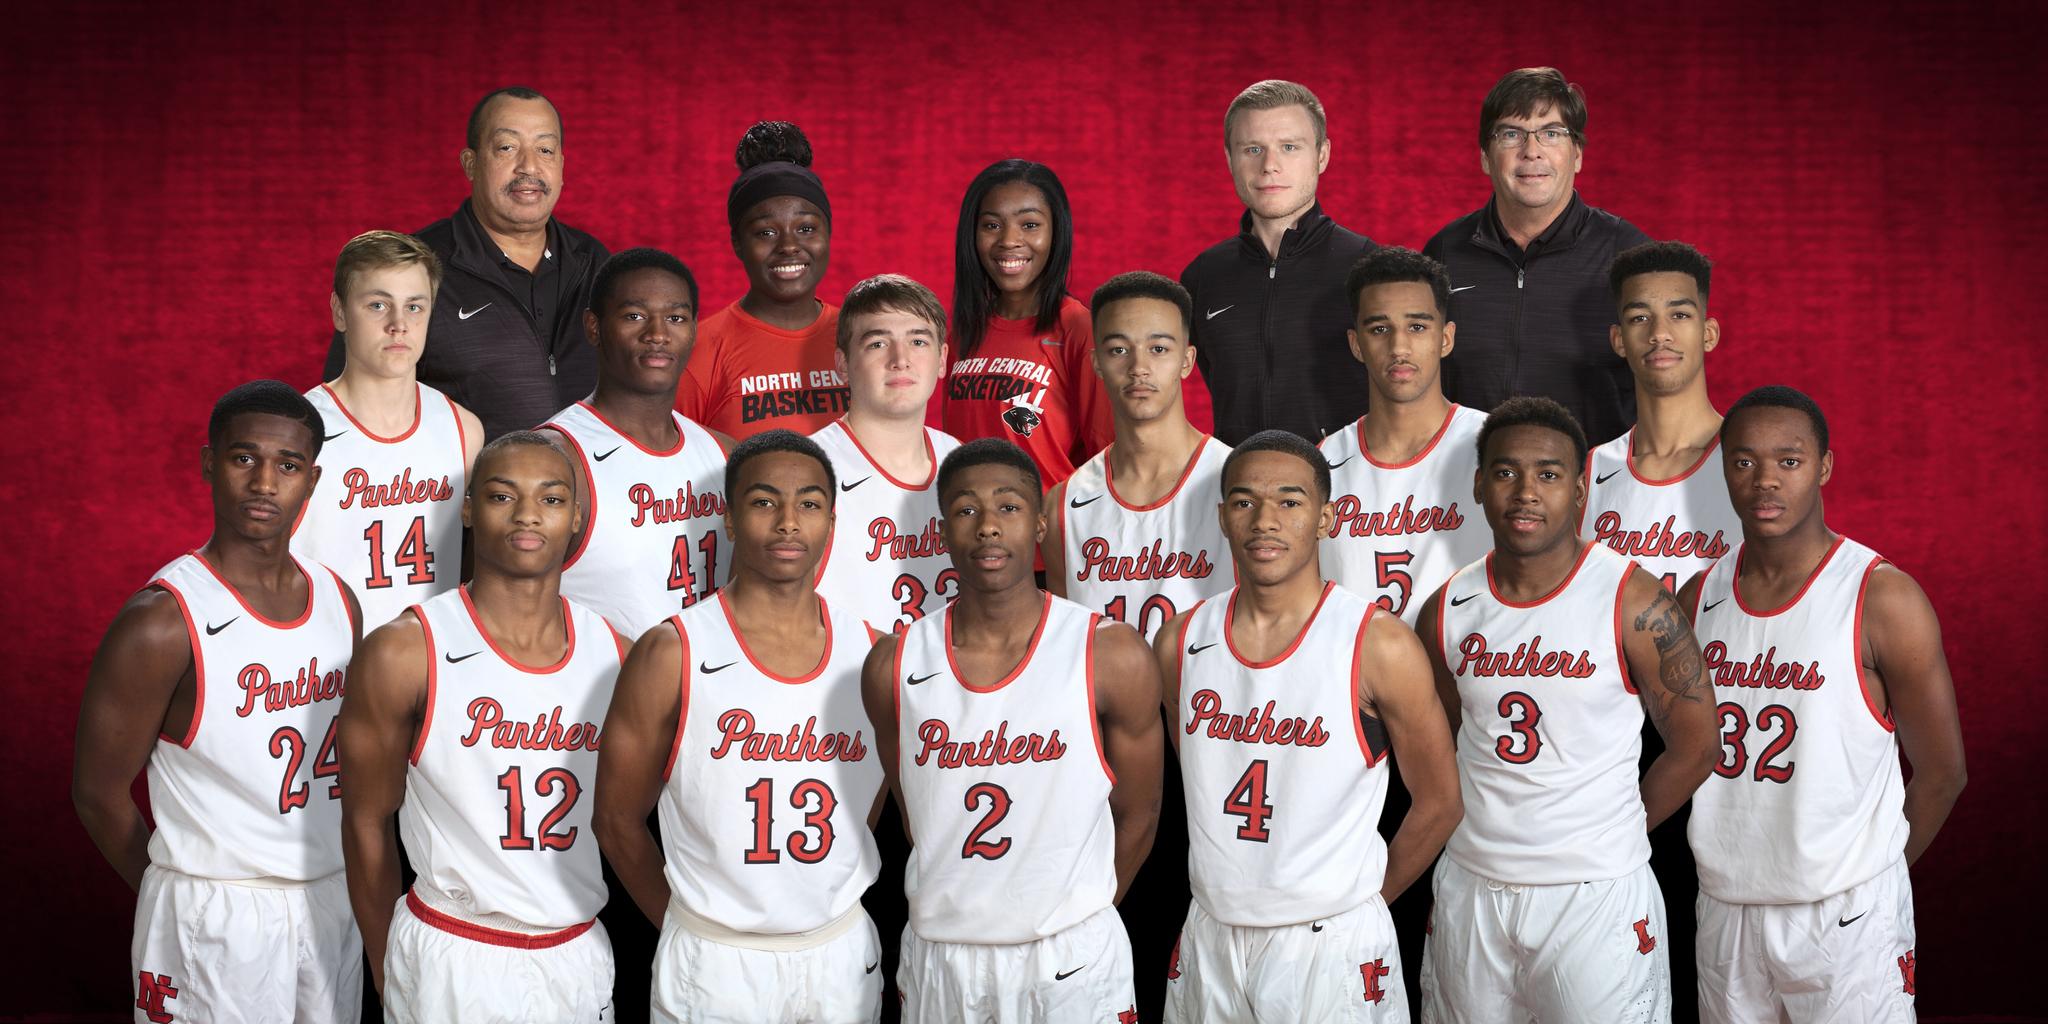 2018 IHSAA Boys Basketball Sectional Information